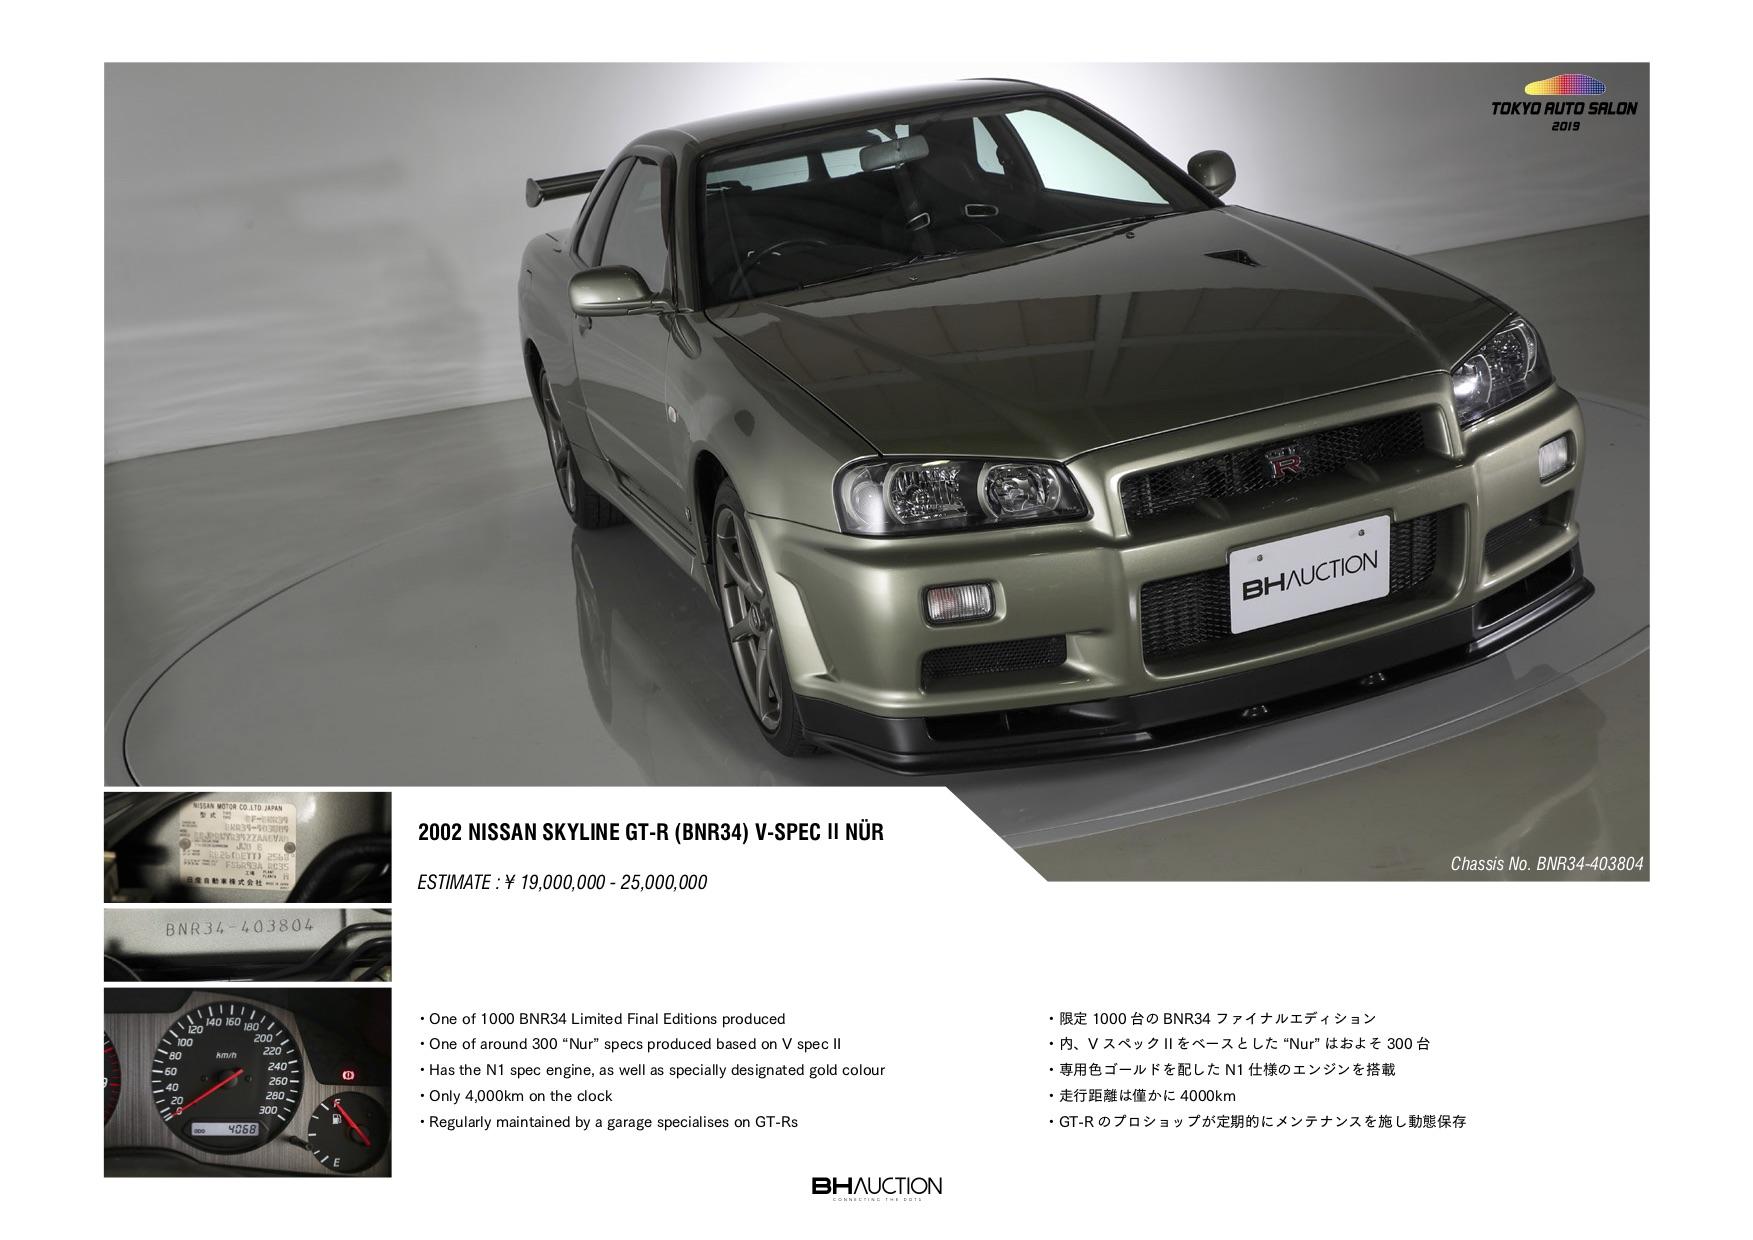 2002 Nissan Skyline GT-R V-Spec II Nur